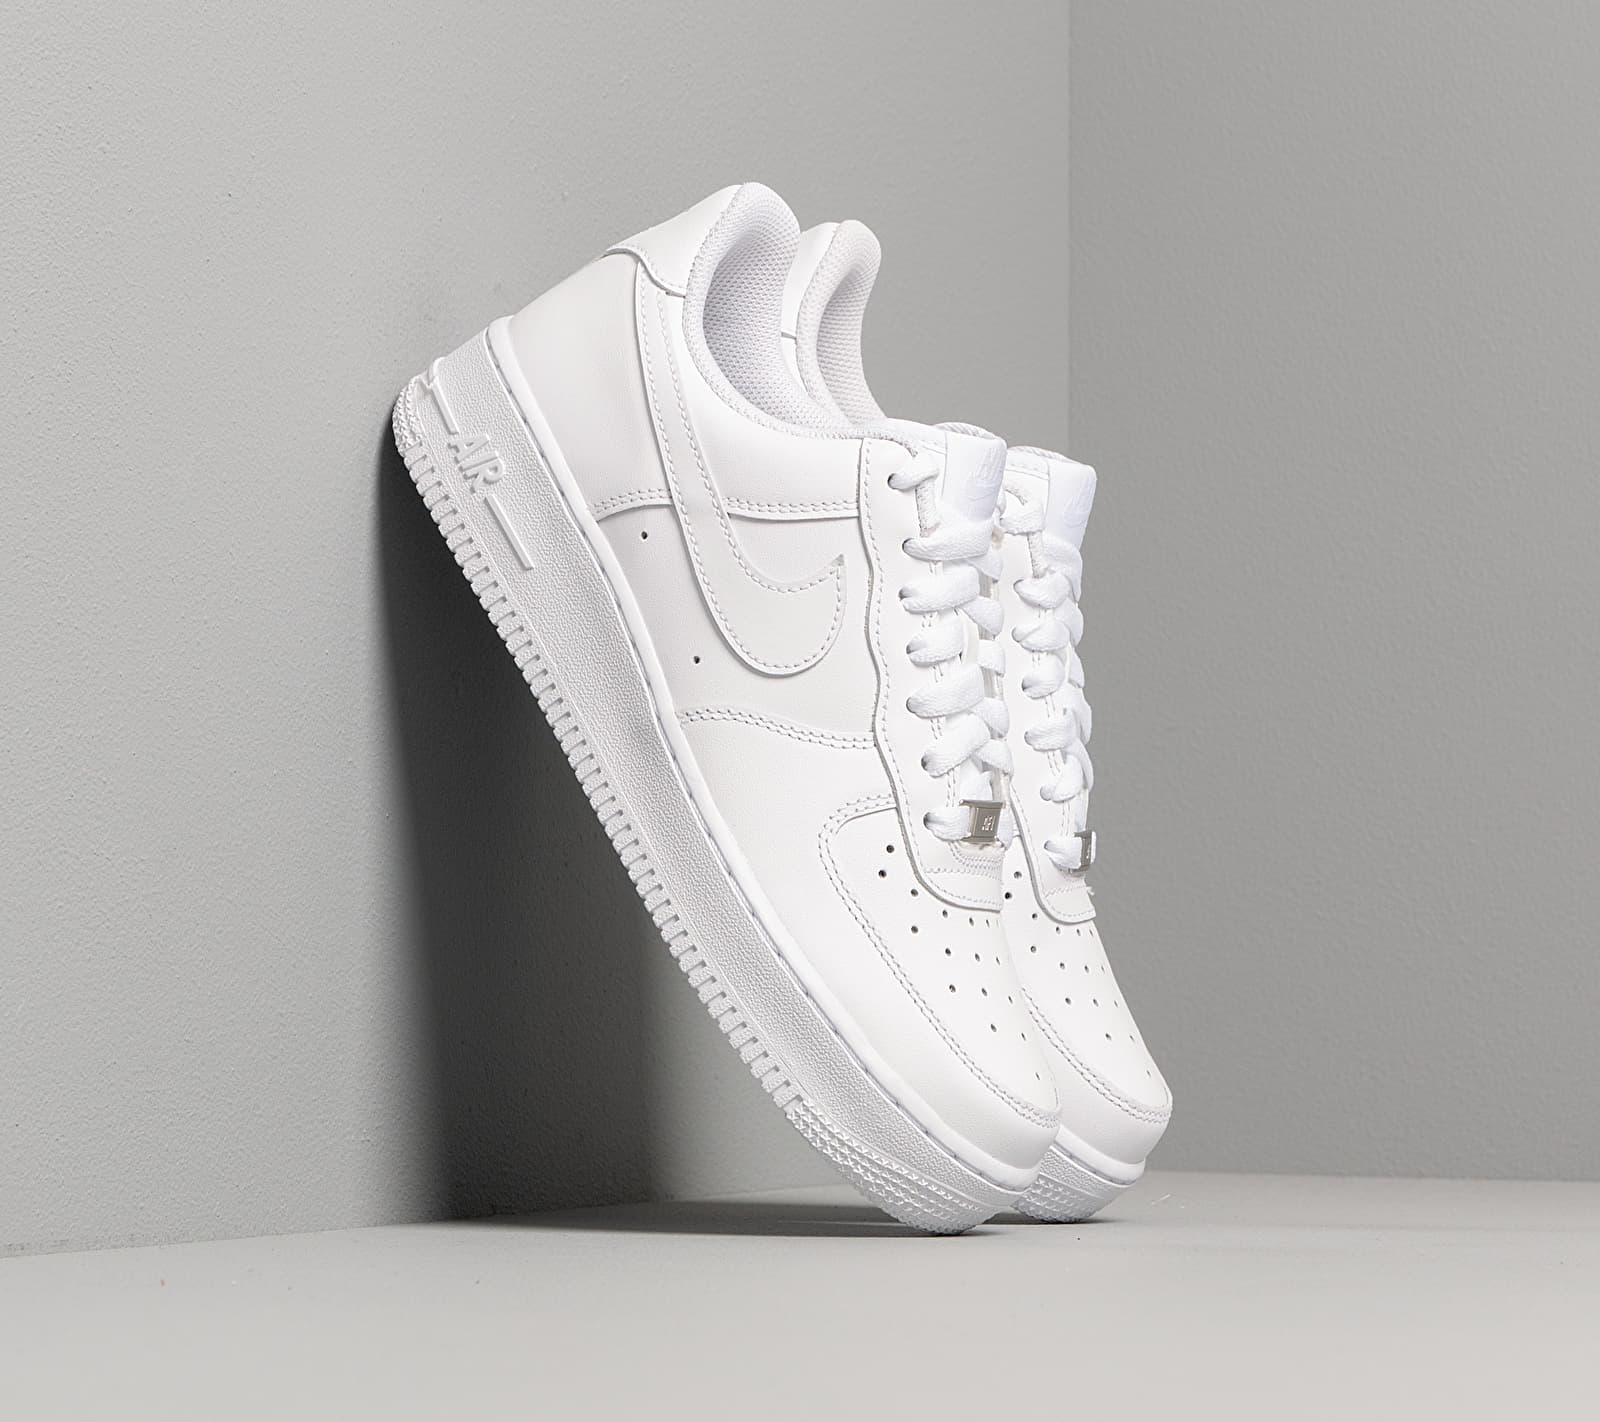 Nike Wmns Air Force 1 '07 White/ White EUR 36